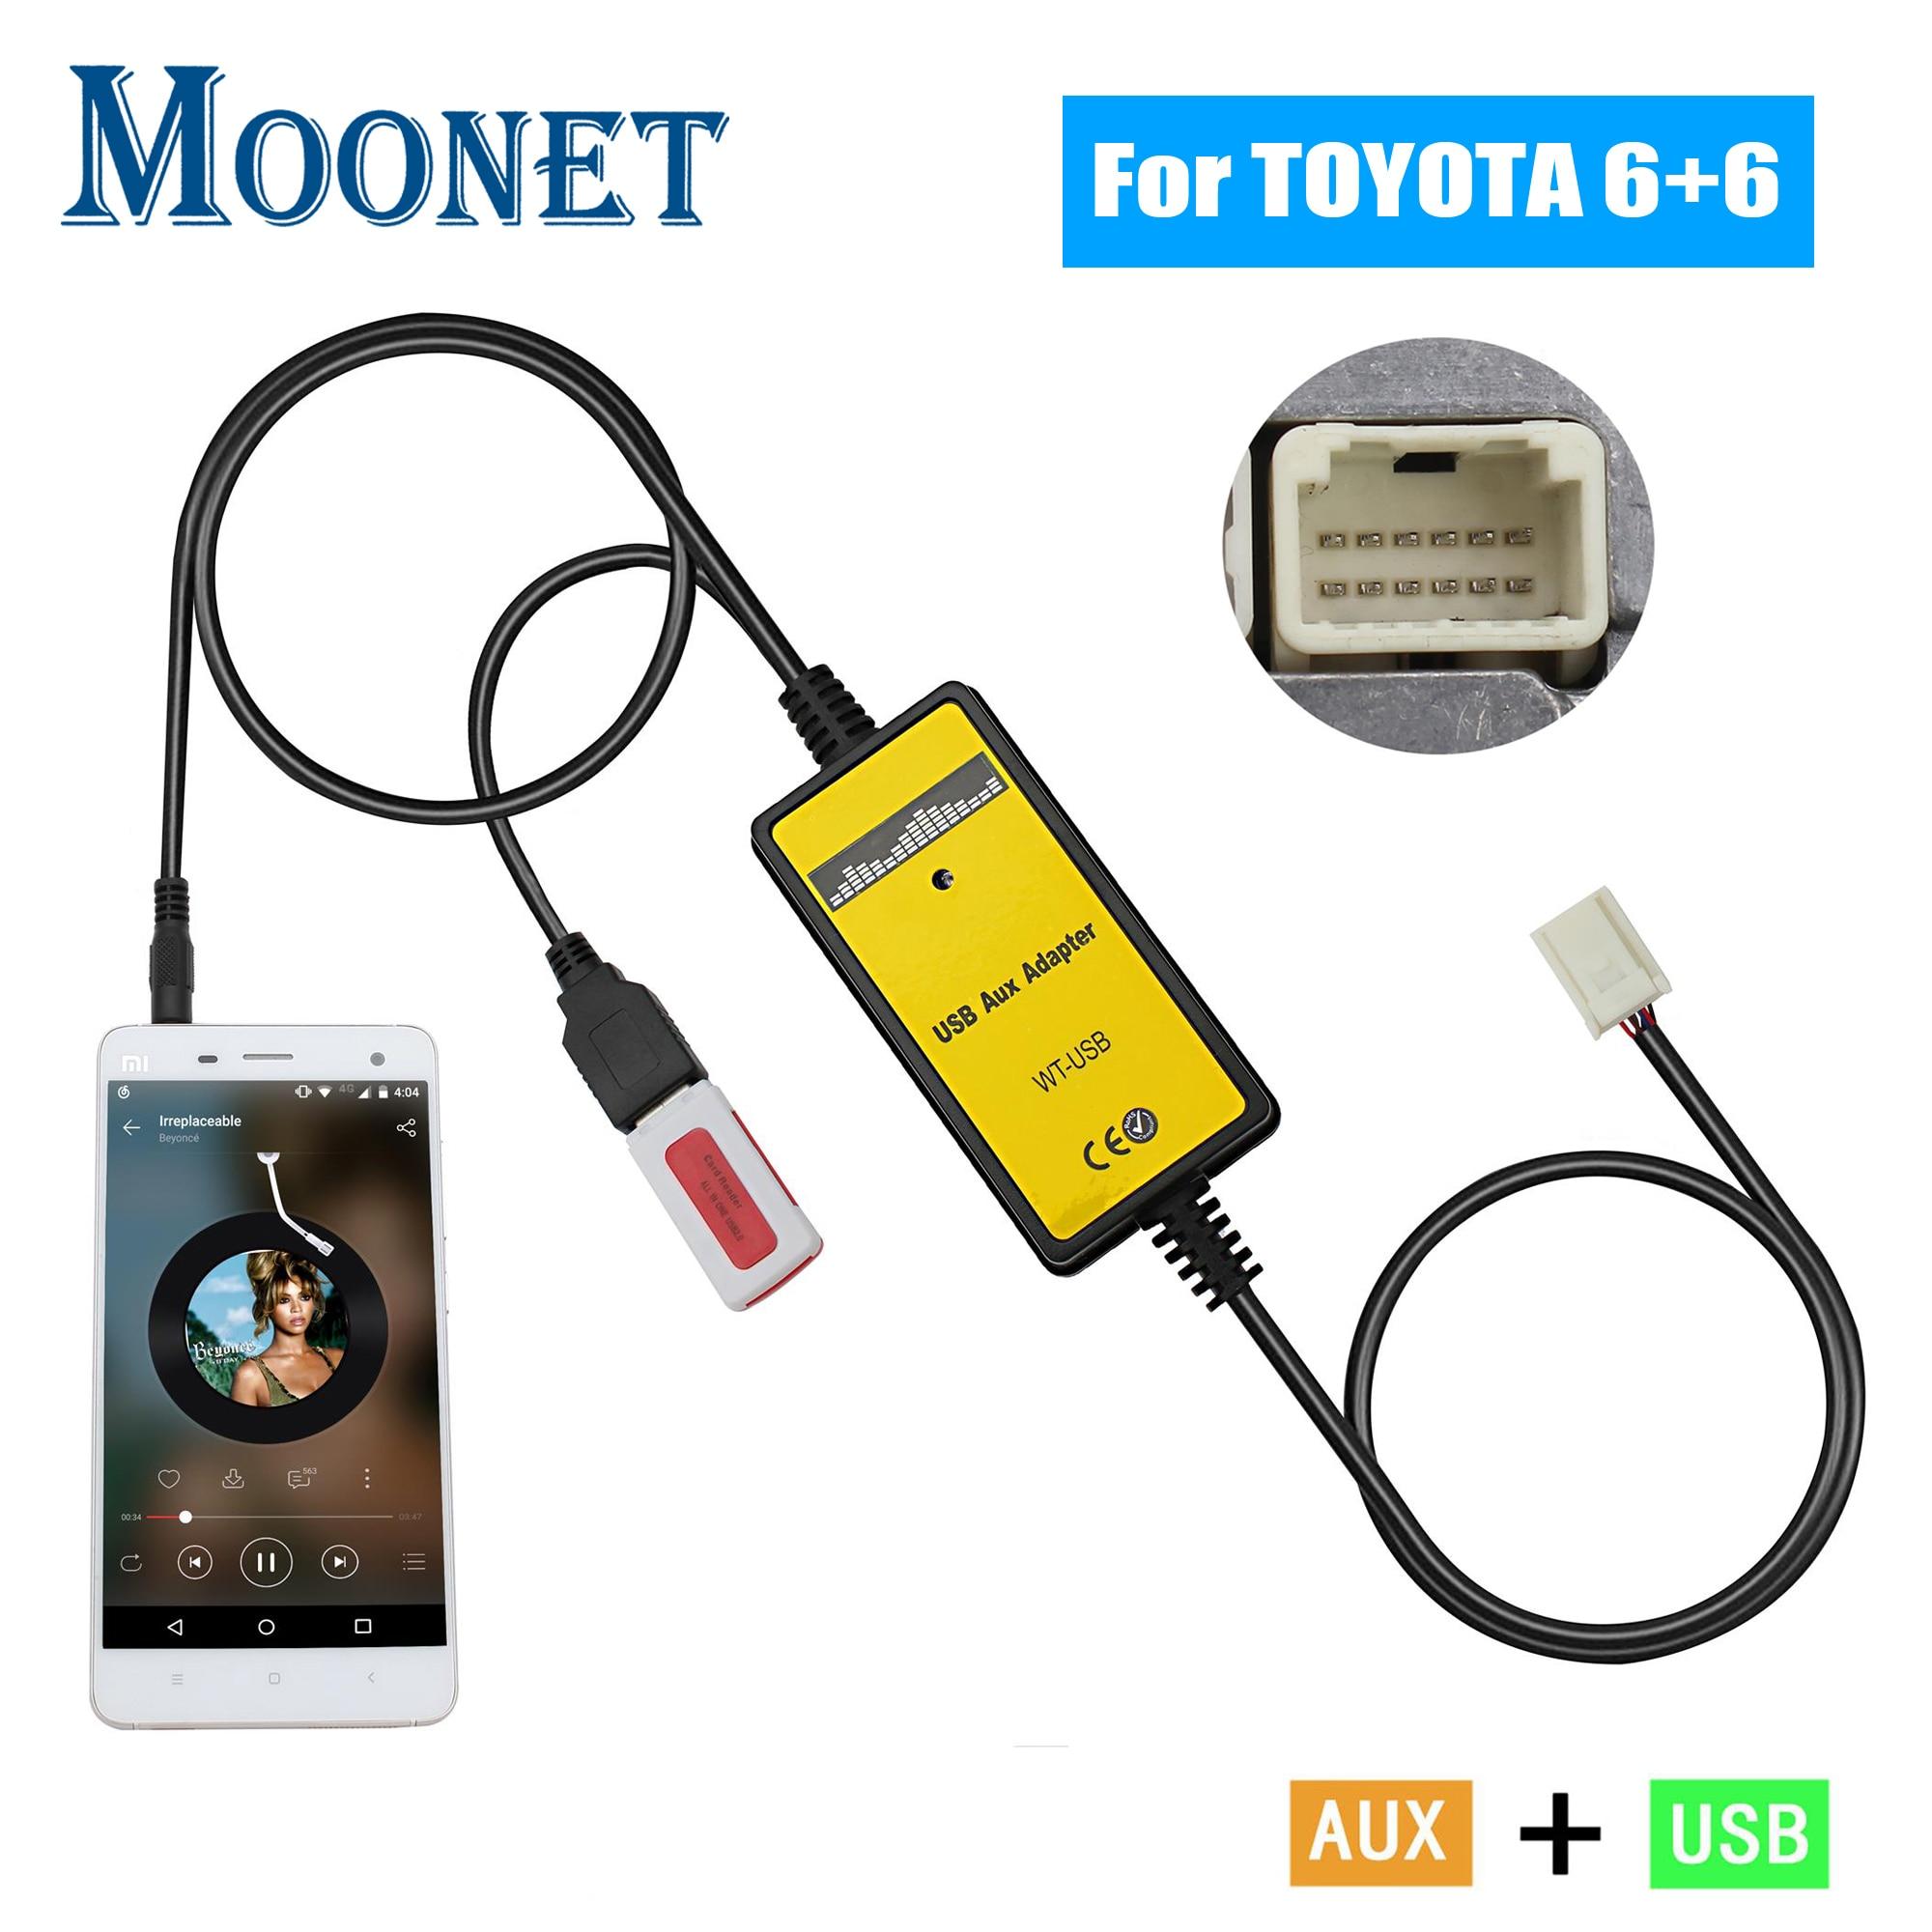 Moonet Car MP3 USB AUX Adapter 3.5mm AUX Interface CD Changer For Toyota (6+6pin) Avensis RAV4 Auris  Corolla Yaris QX005